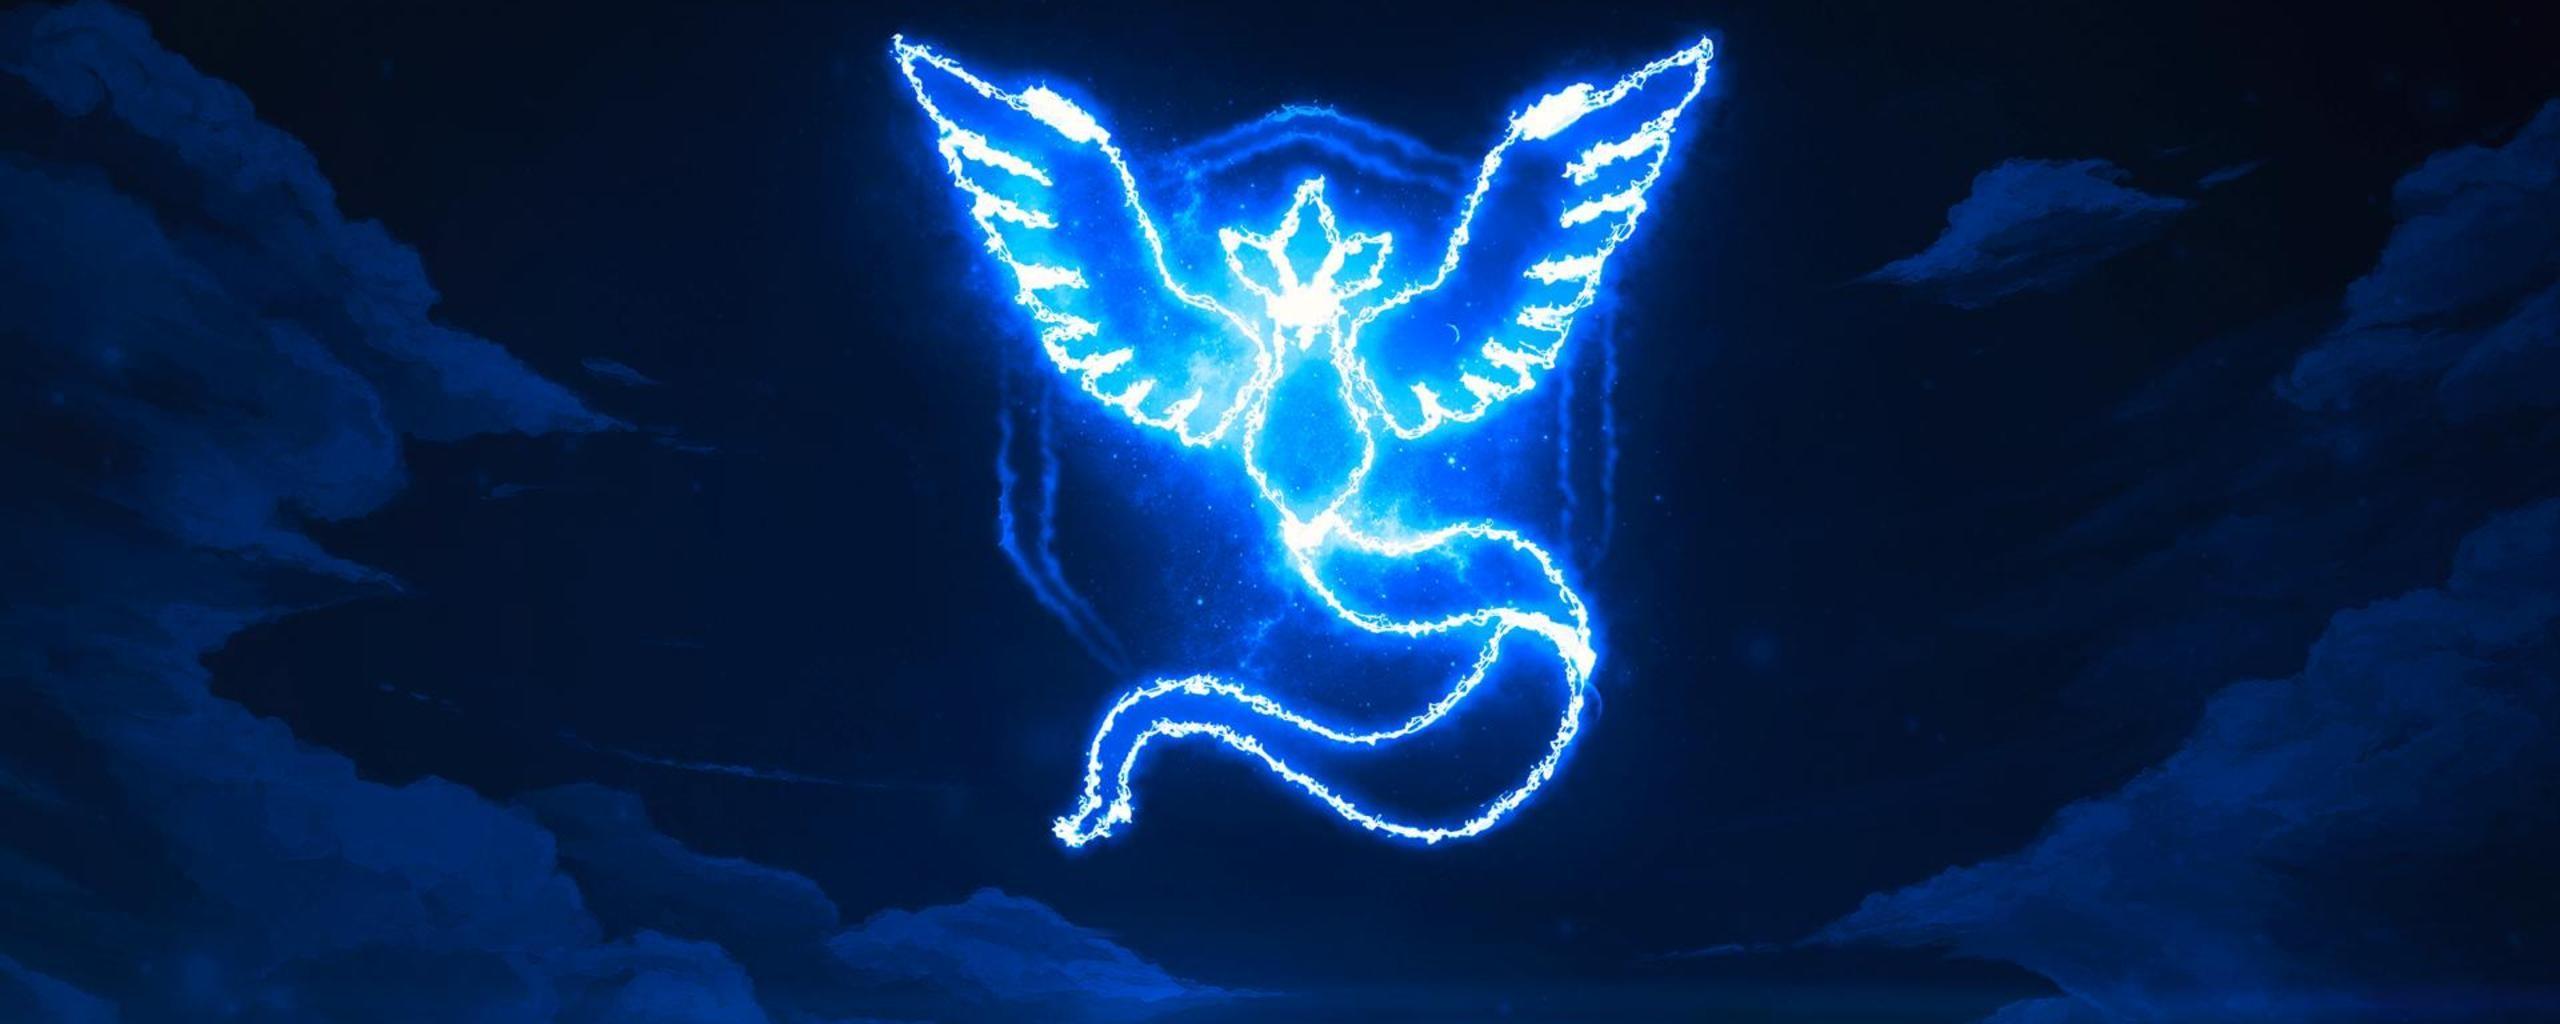 Pokemon Go Mystic Logo Transparent Images